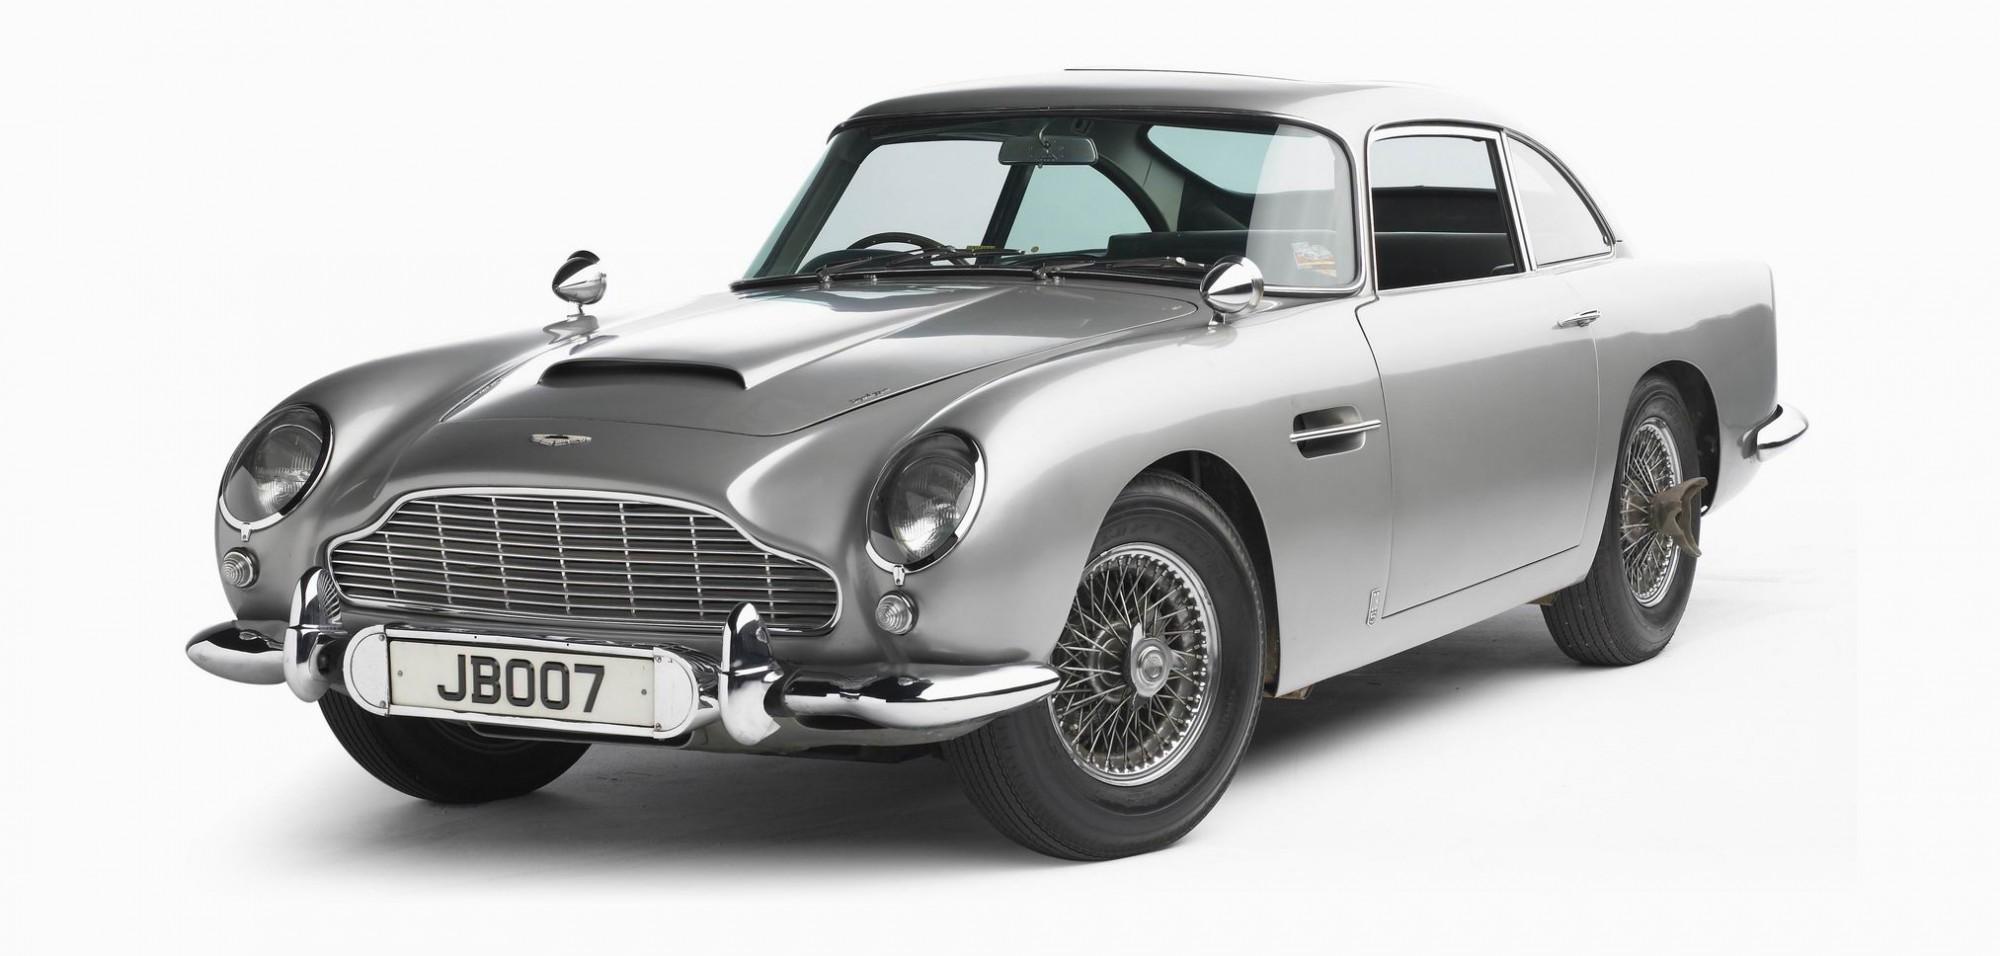 Aston_Martin_DB5_007JB_1964